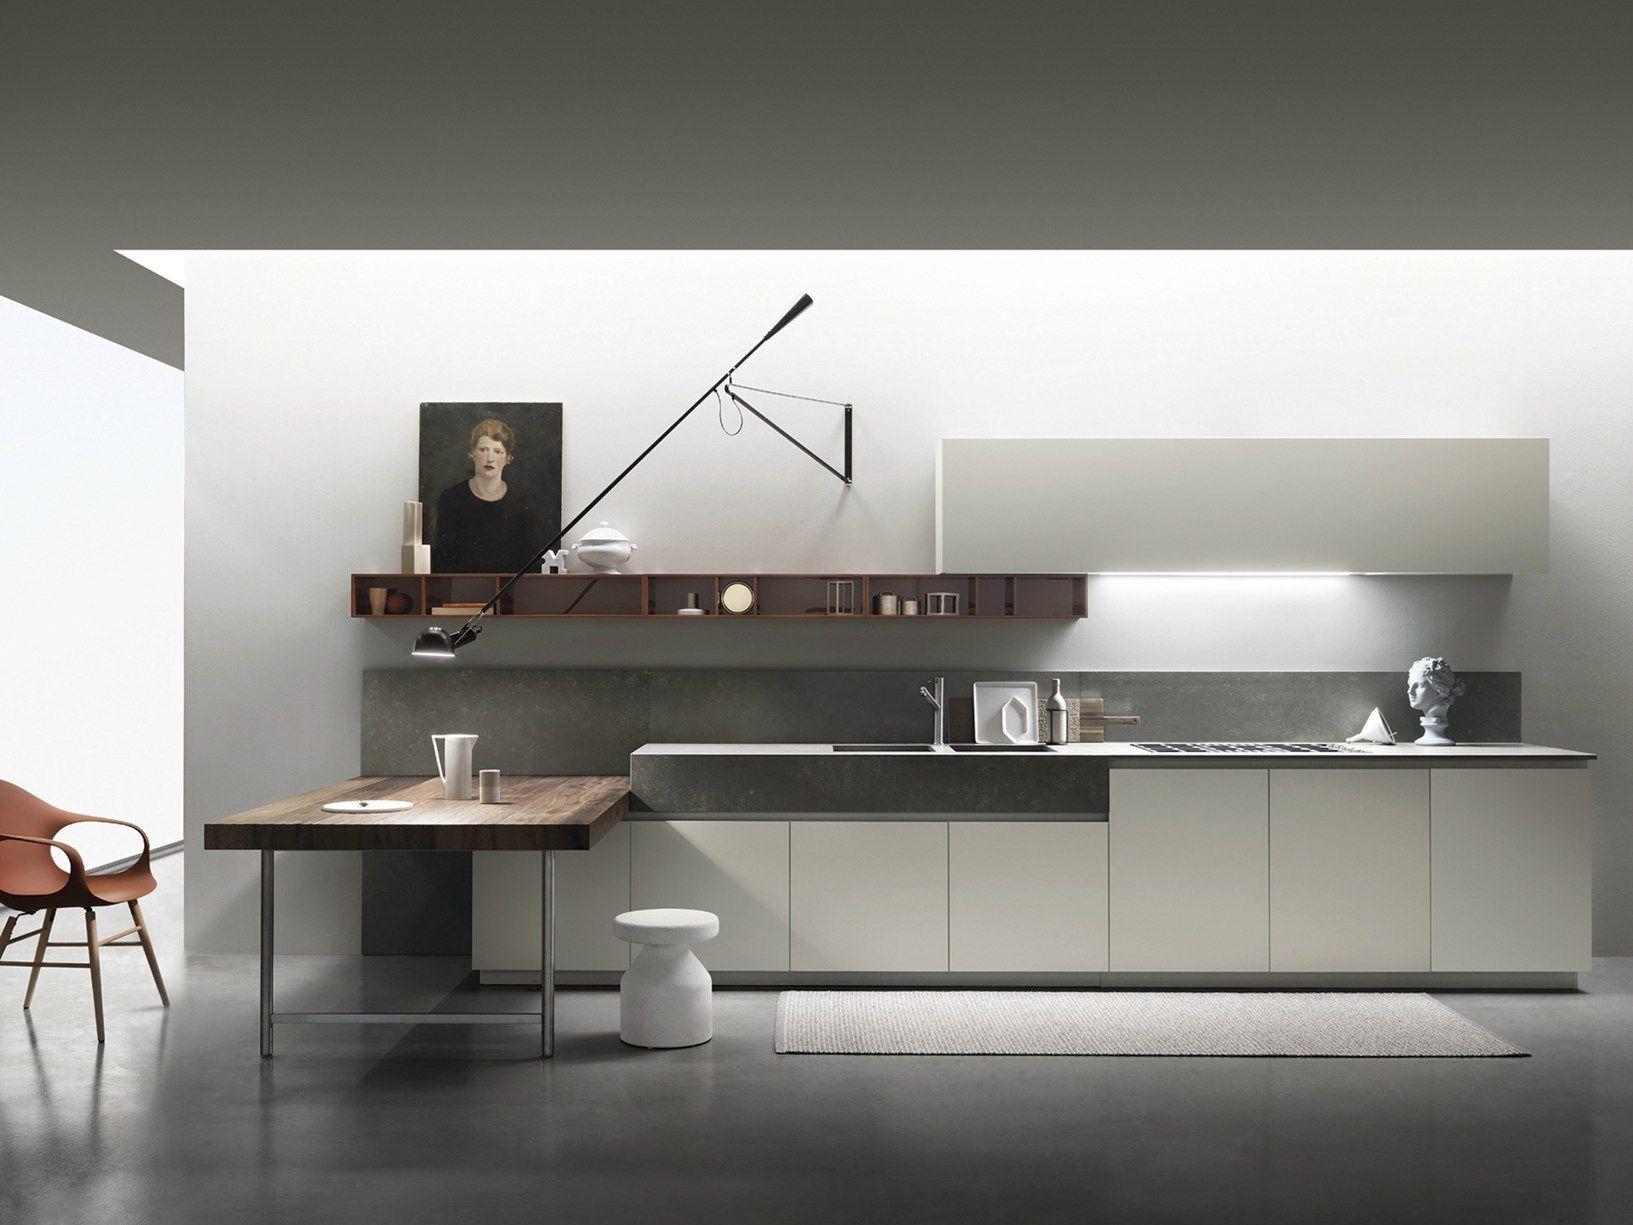 Ernestomeda rinnova la cucina one - Cucine fascia alta ...